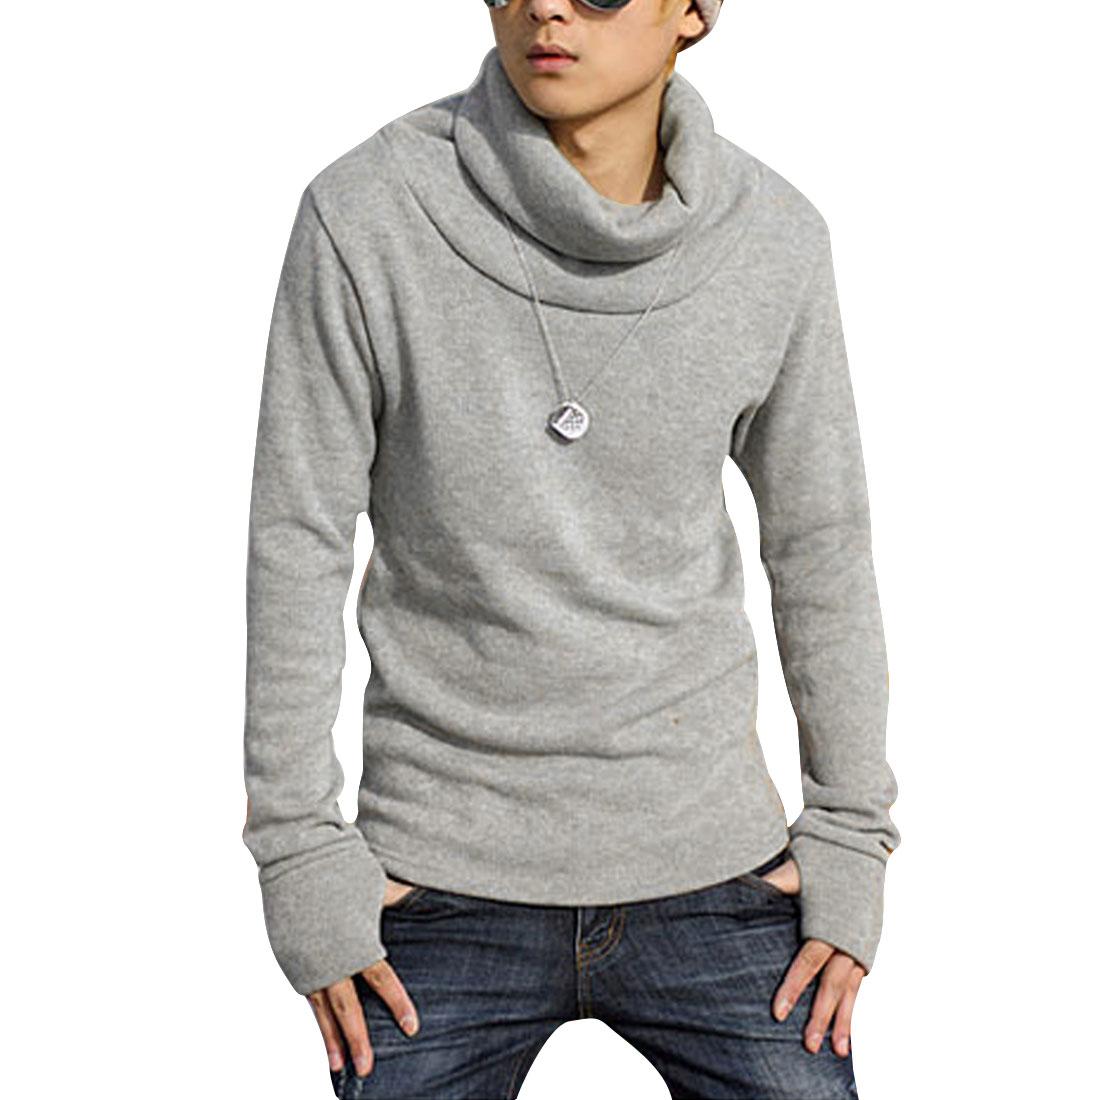 Mens Fashion Light Gray Turtle Neck Slipover Knit Primer Shirt M